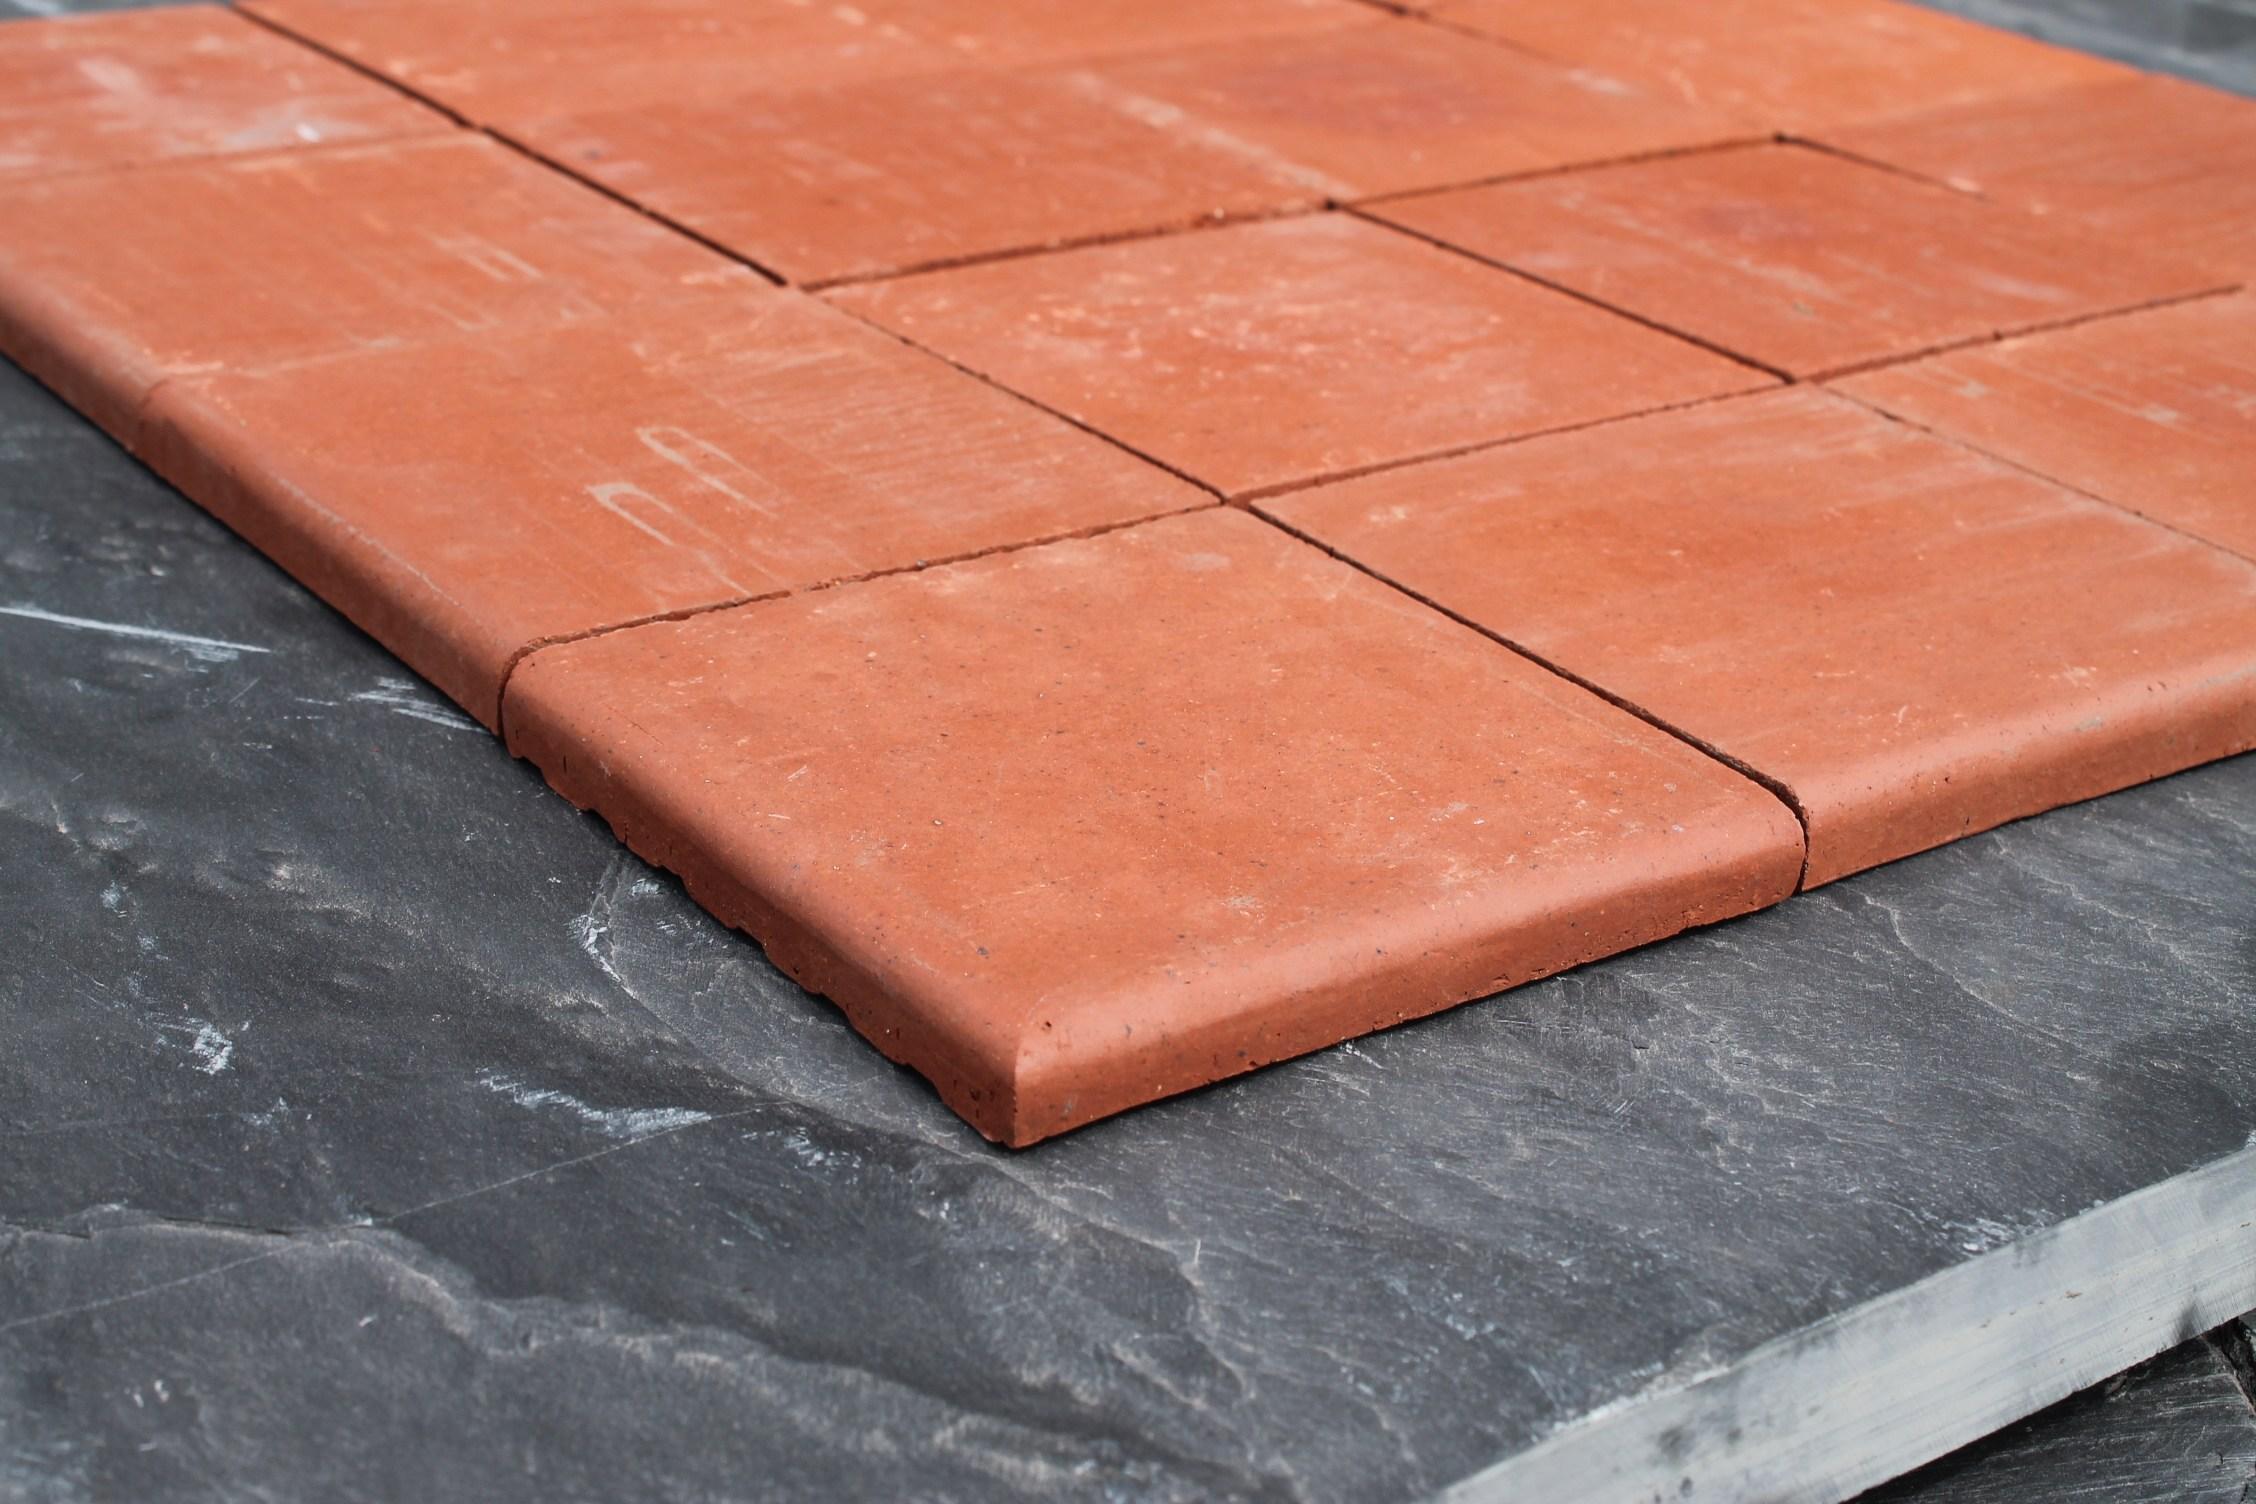 New Red Quarry Tiles Double Bullnose 6x6 Cawarden Reclaim